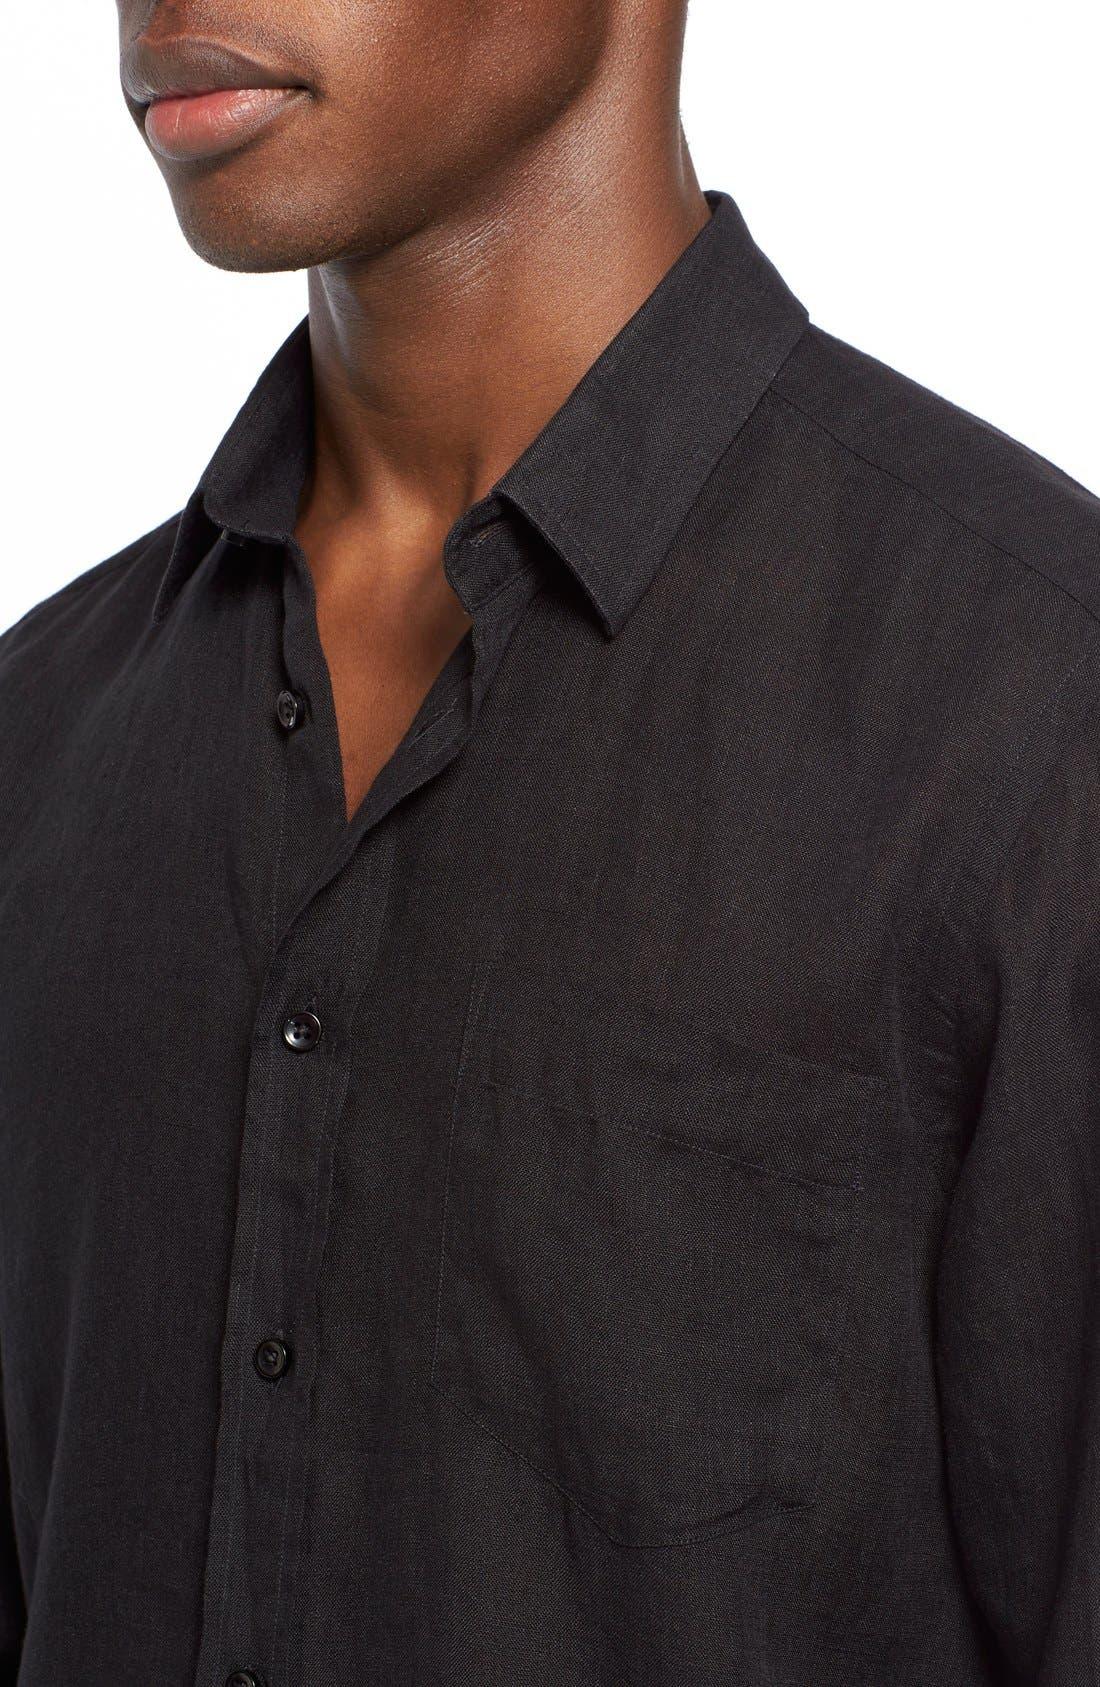 'Caroubier' Linen Shirt,                             Alternate thumbnail 41, color,